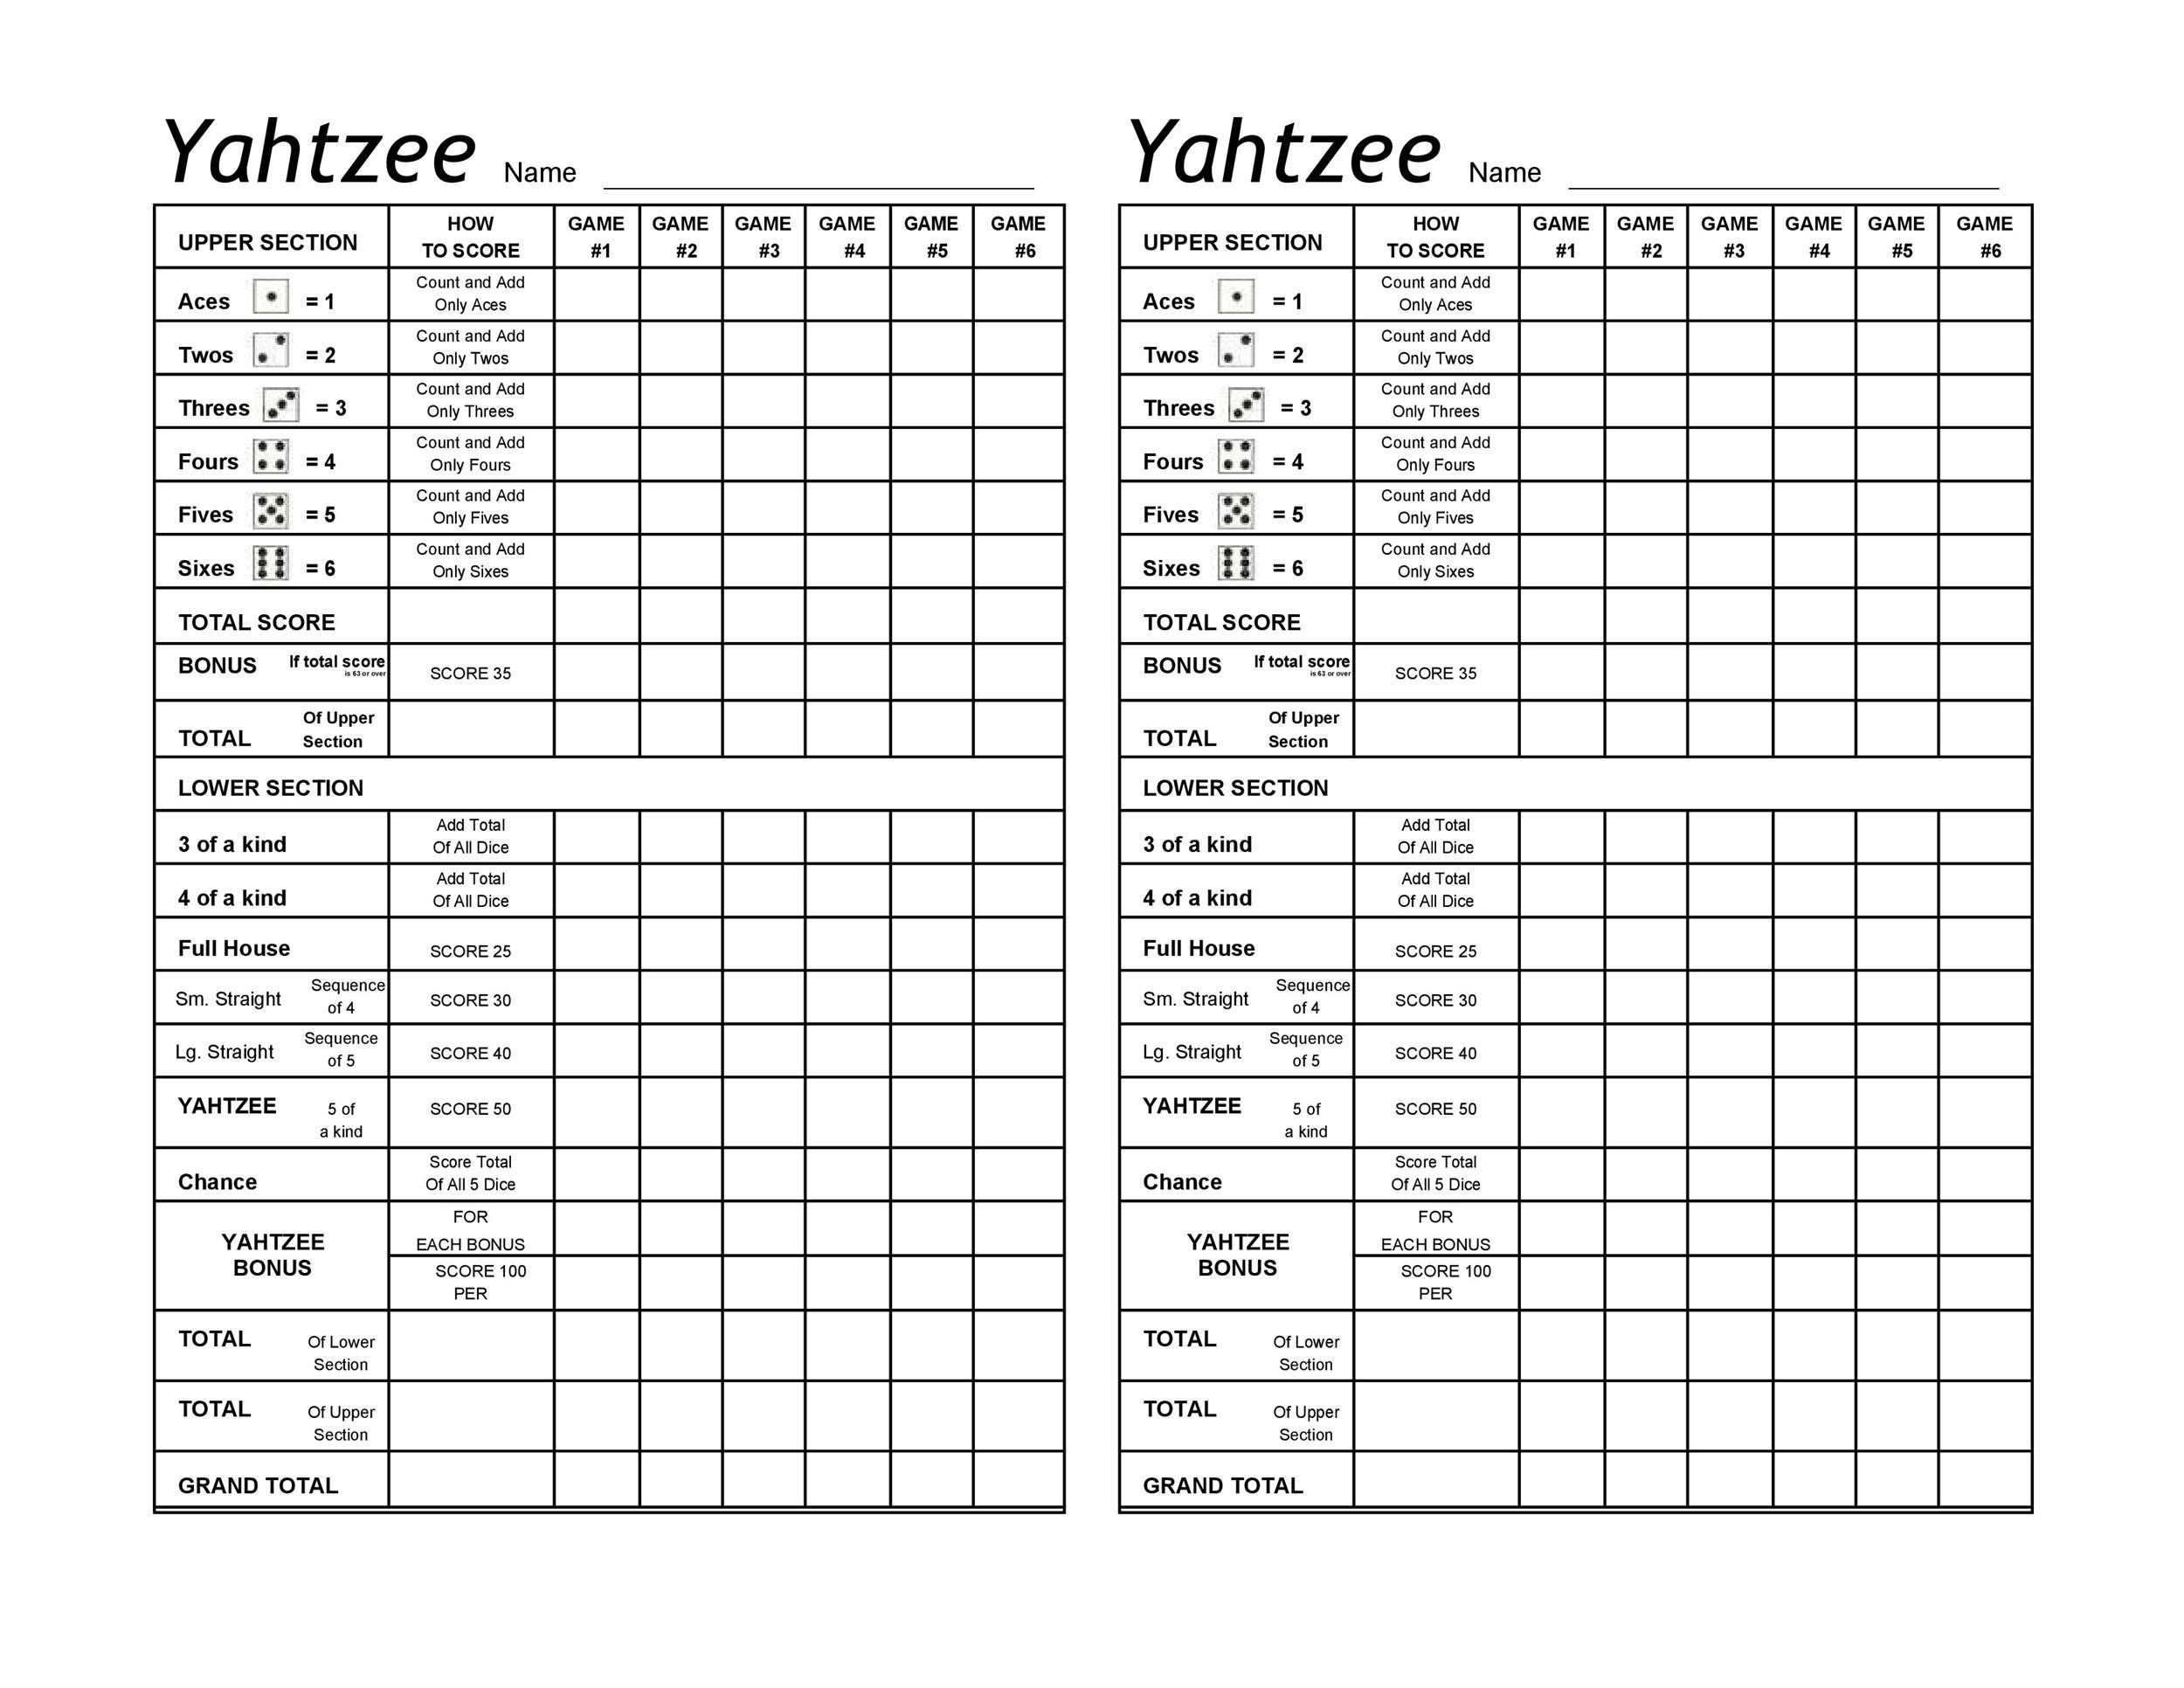 image regarding Yahtzee Score Sheets Printable called yahtzee rating card pdf